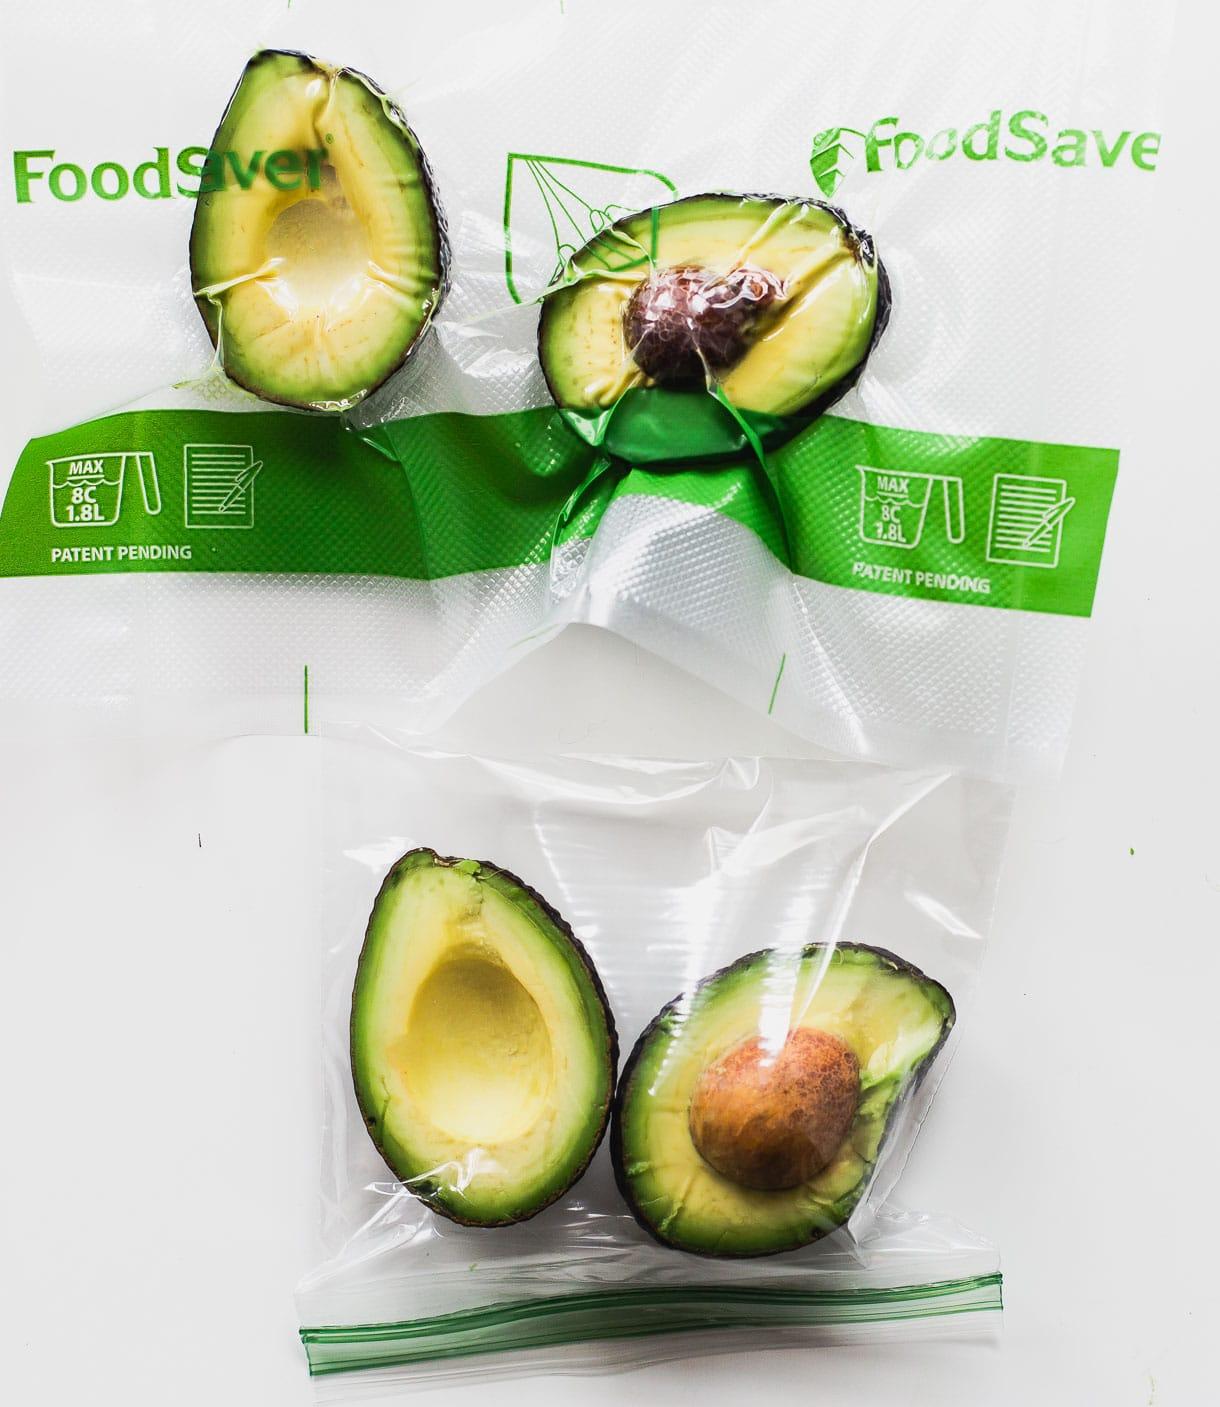 FoodSaver preserve avocado